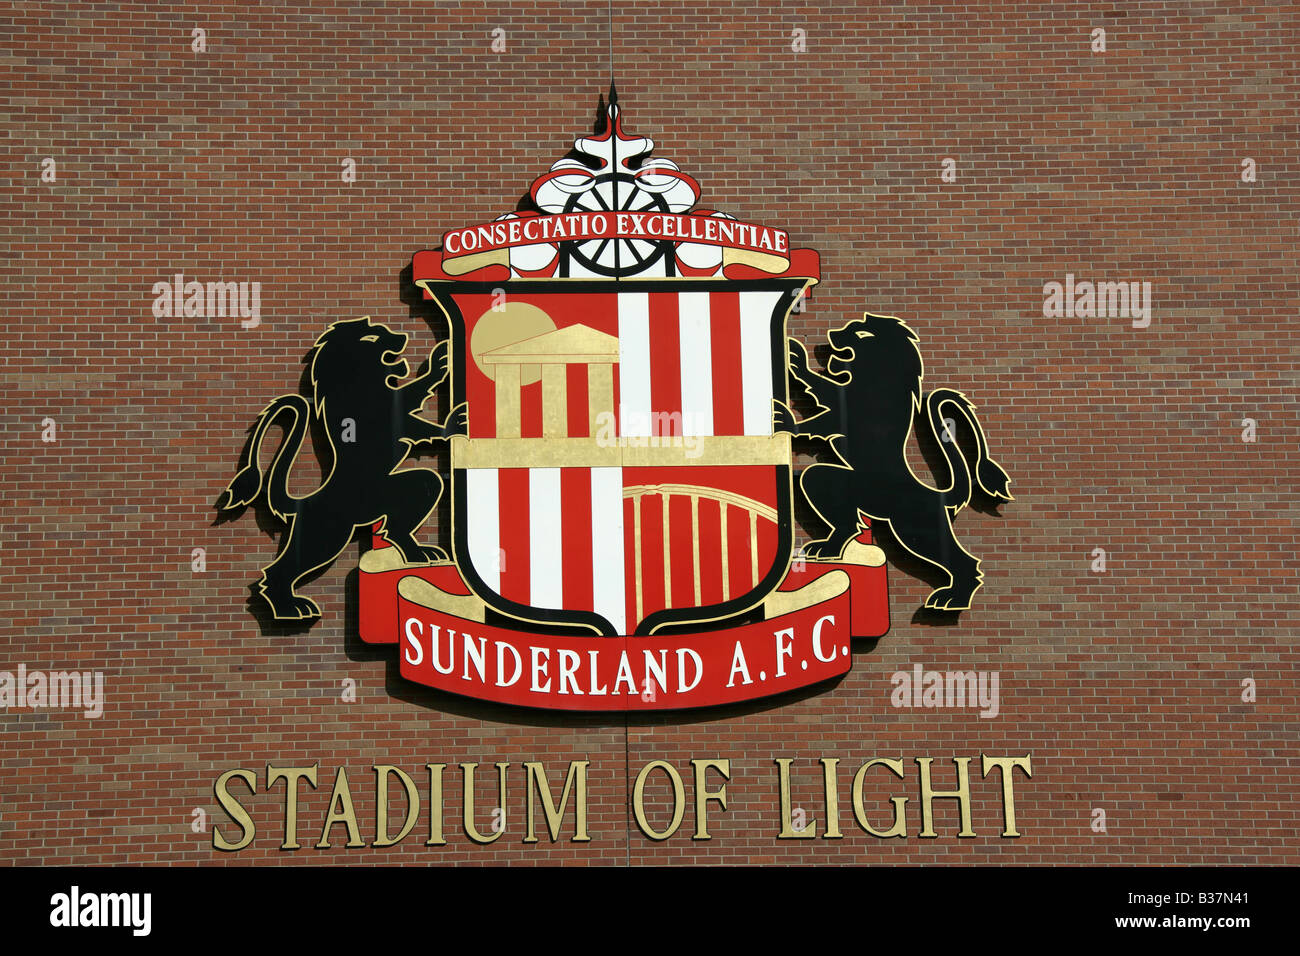 City of Sunderland, England. Sunderland AFC football crest on the west façade of  the Stadium of Light. - Stock Image